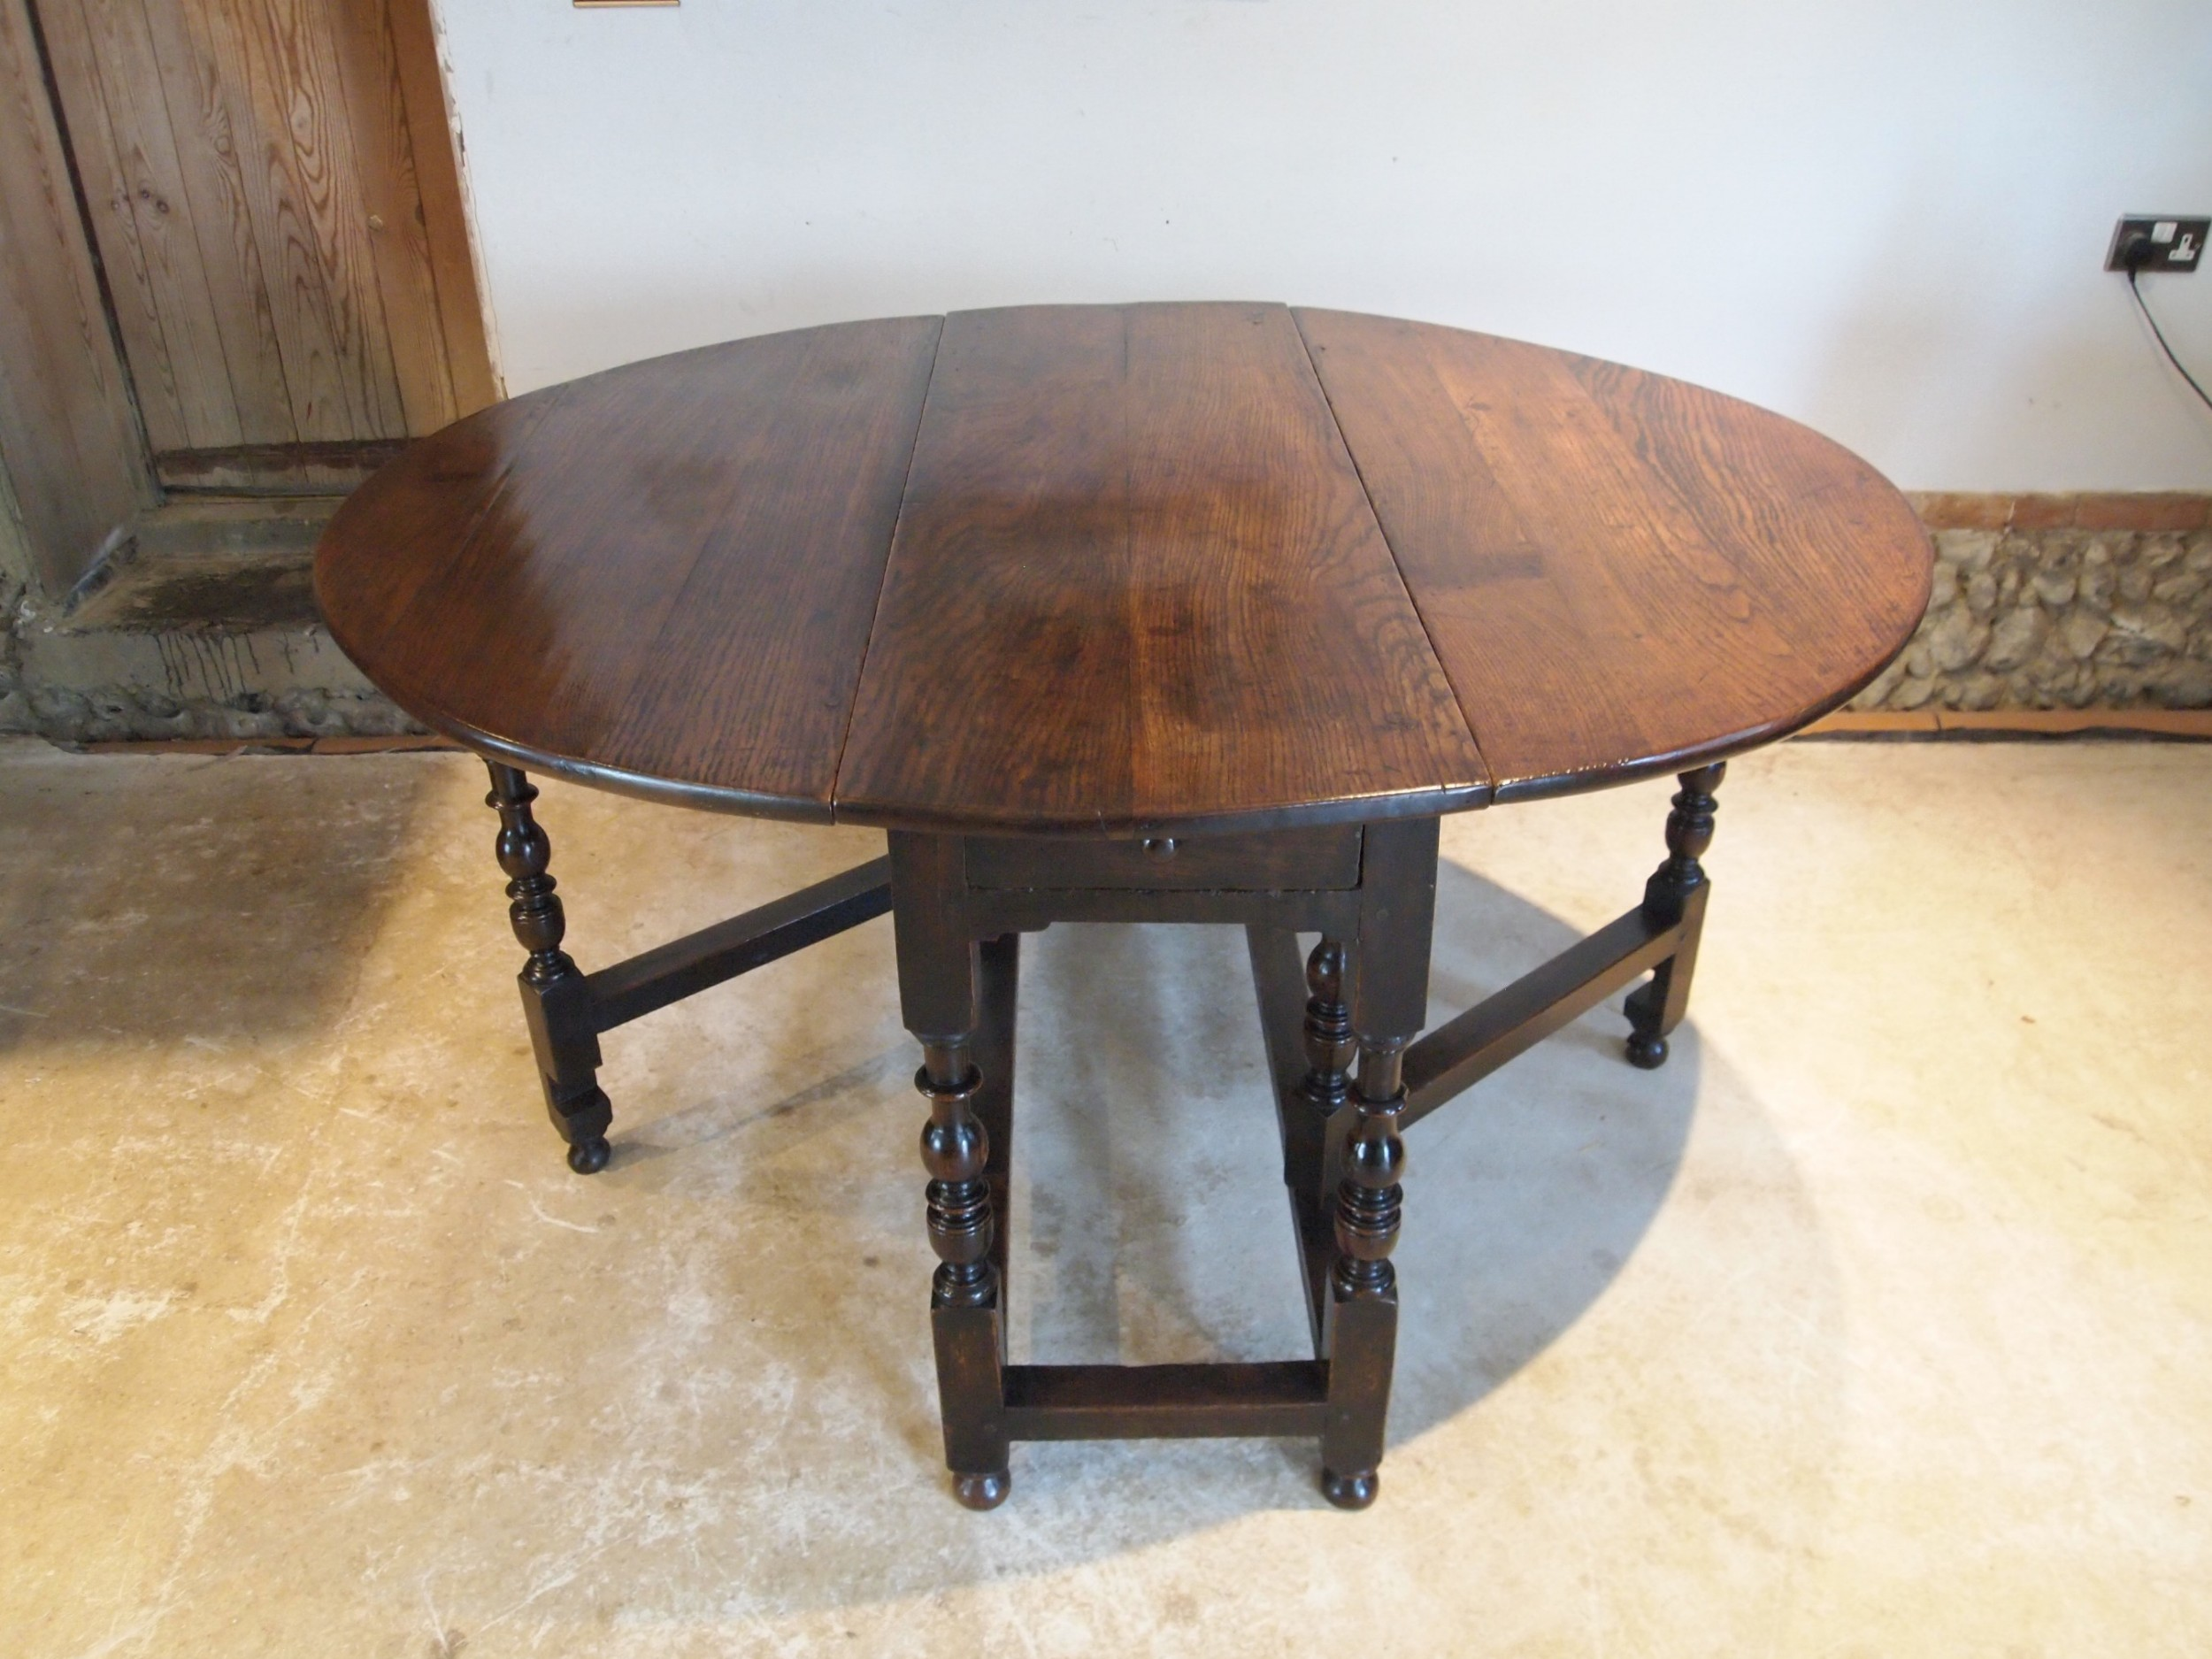 table queen anne oak gate leg dining table c1700